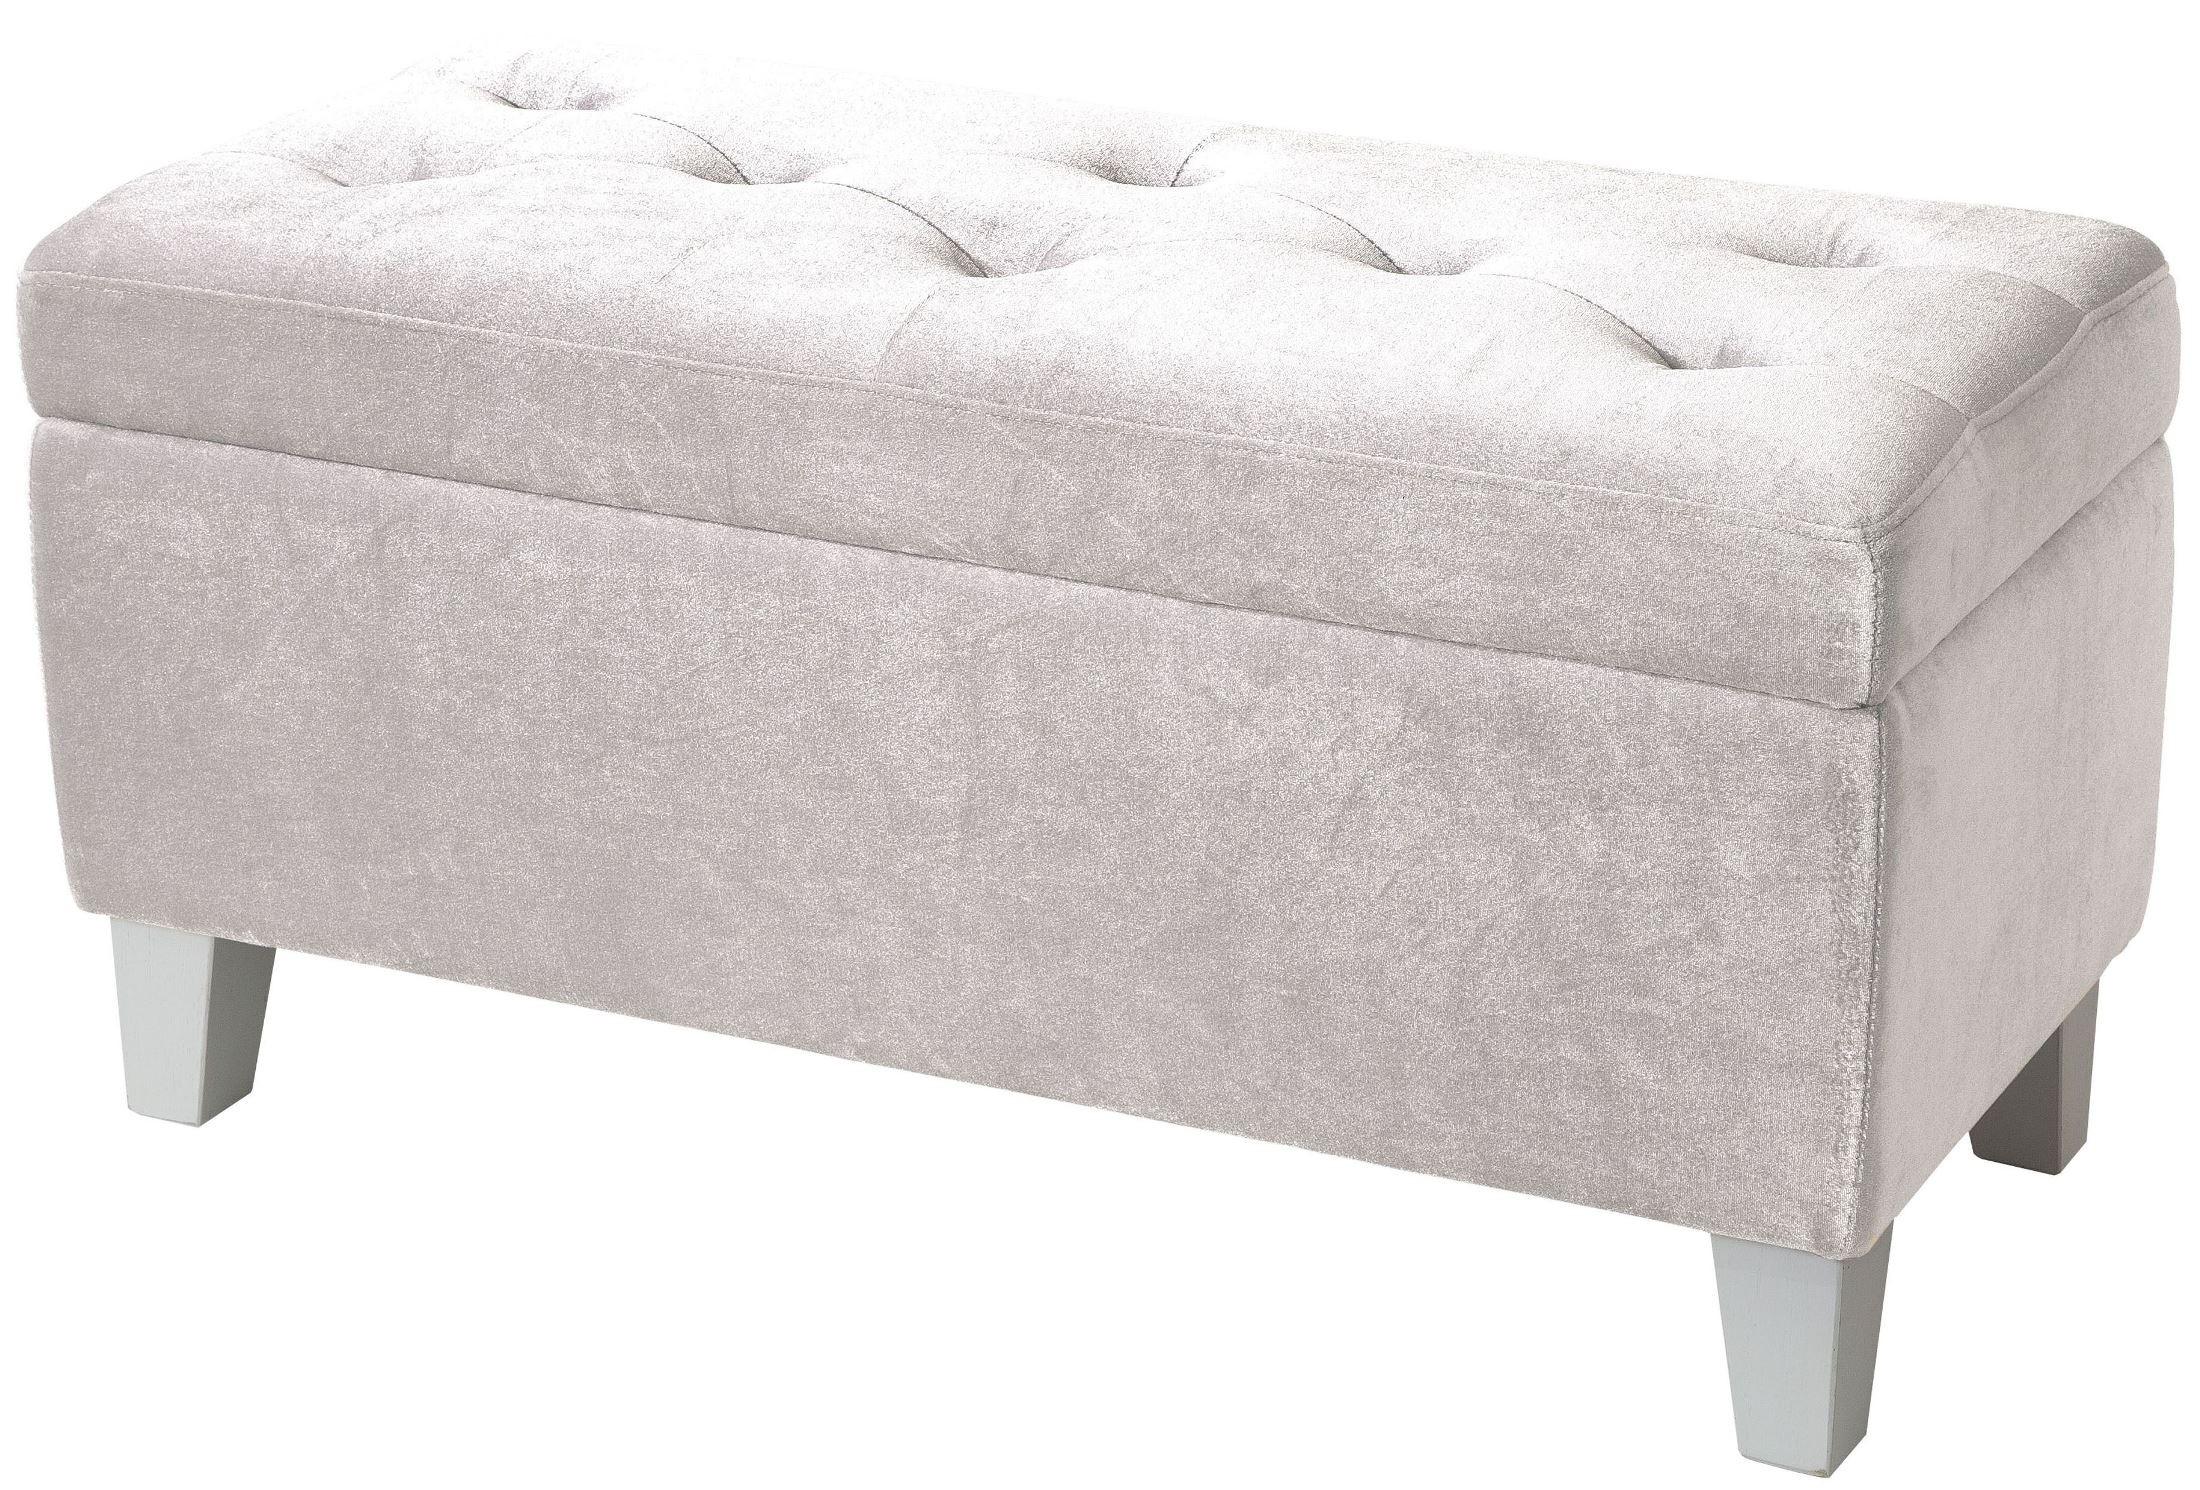 Young parisian white velvet storage bench 65184 standard furniture Velvet storage bench